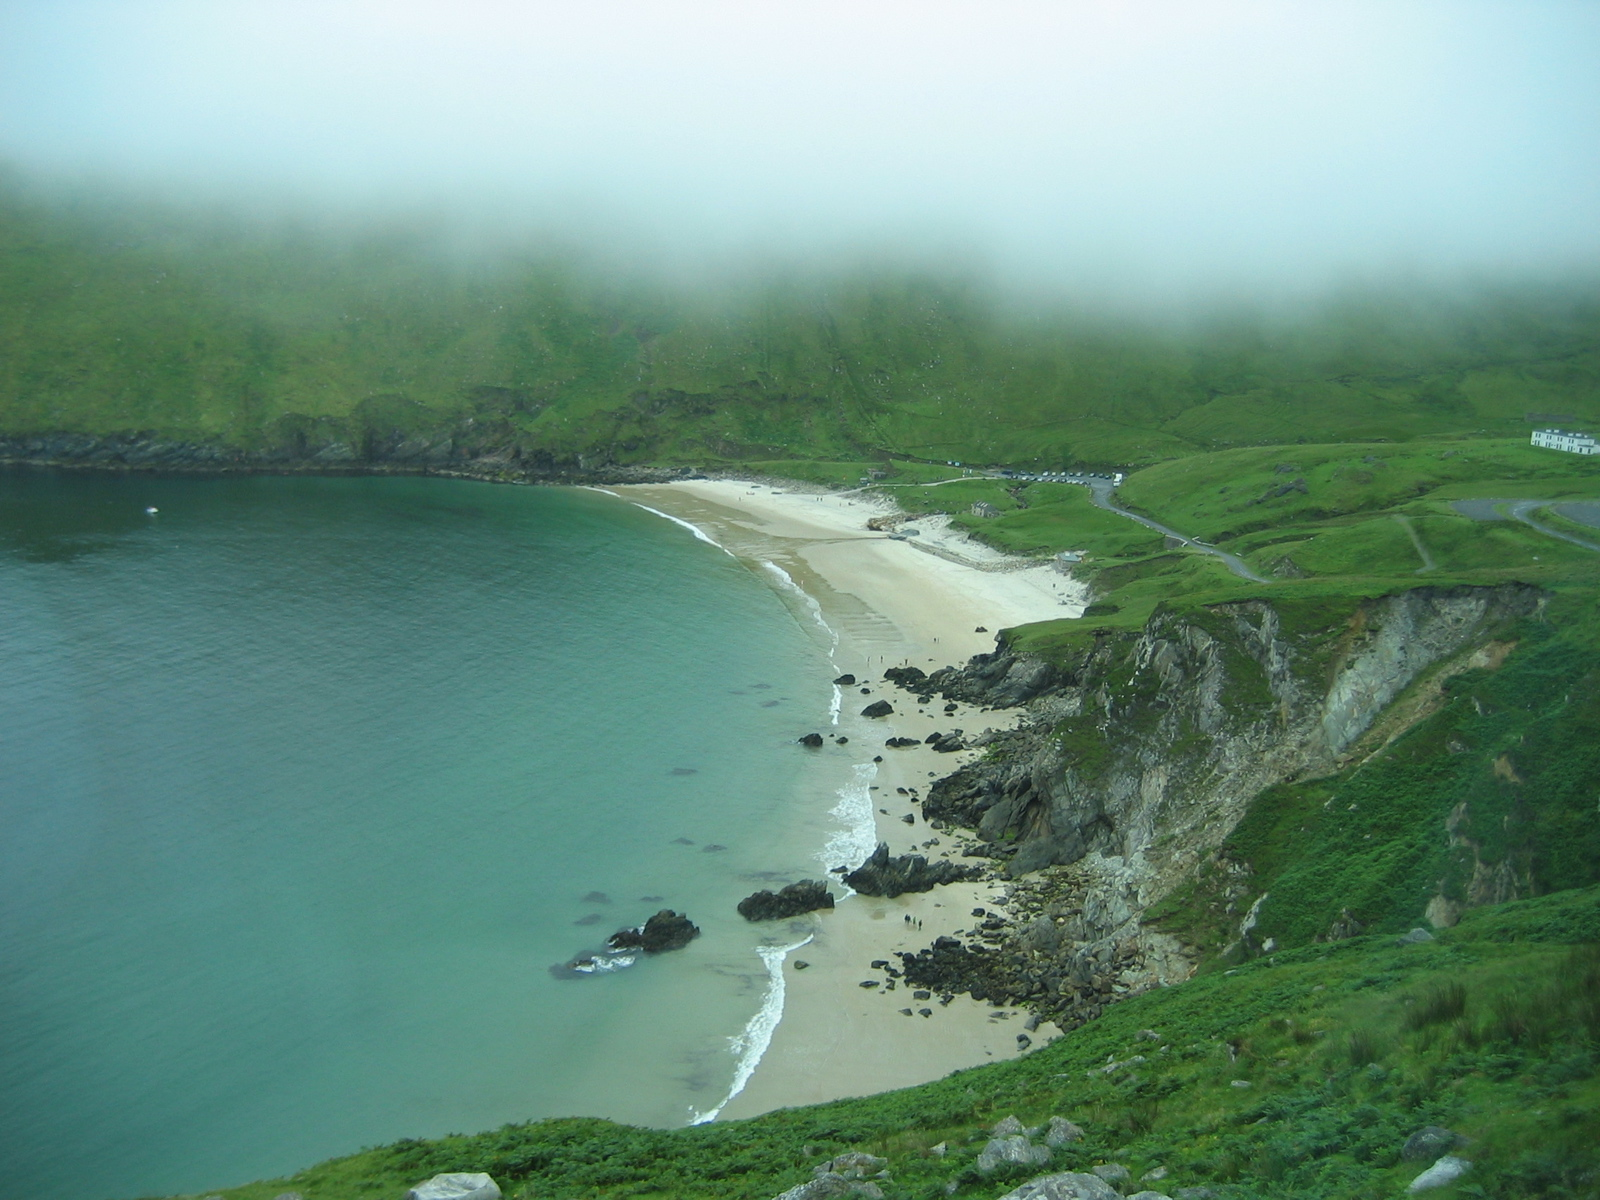 Keel Beach, Achill Island, Co. Mayo